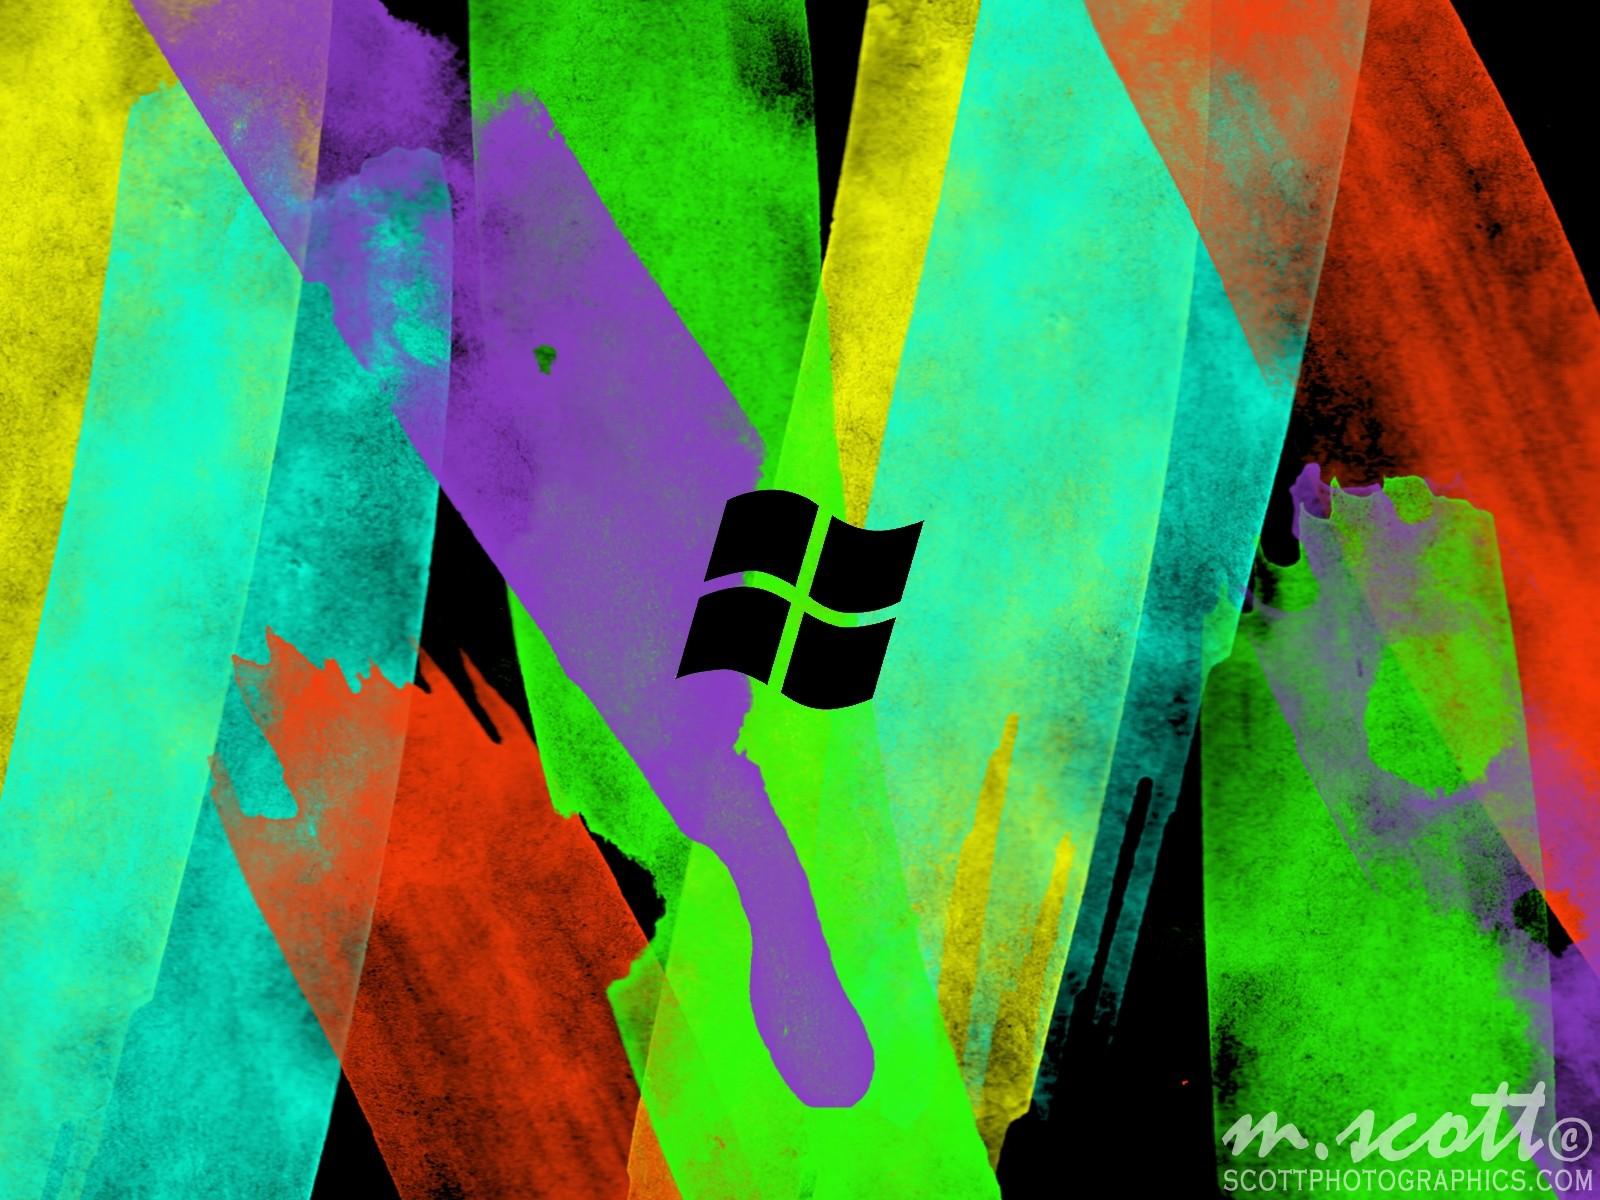 https://www.images.scottphotographics.com/how-to-make-a-water-colour-ubuntu-wallpaper-in-gimp/water-colour-gimp-colours-windows-logo.jpg